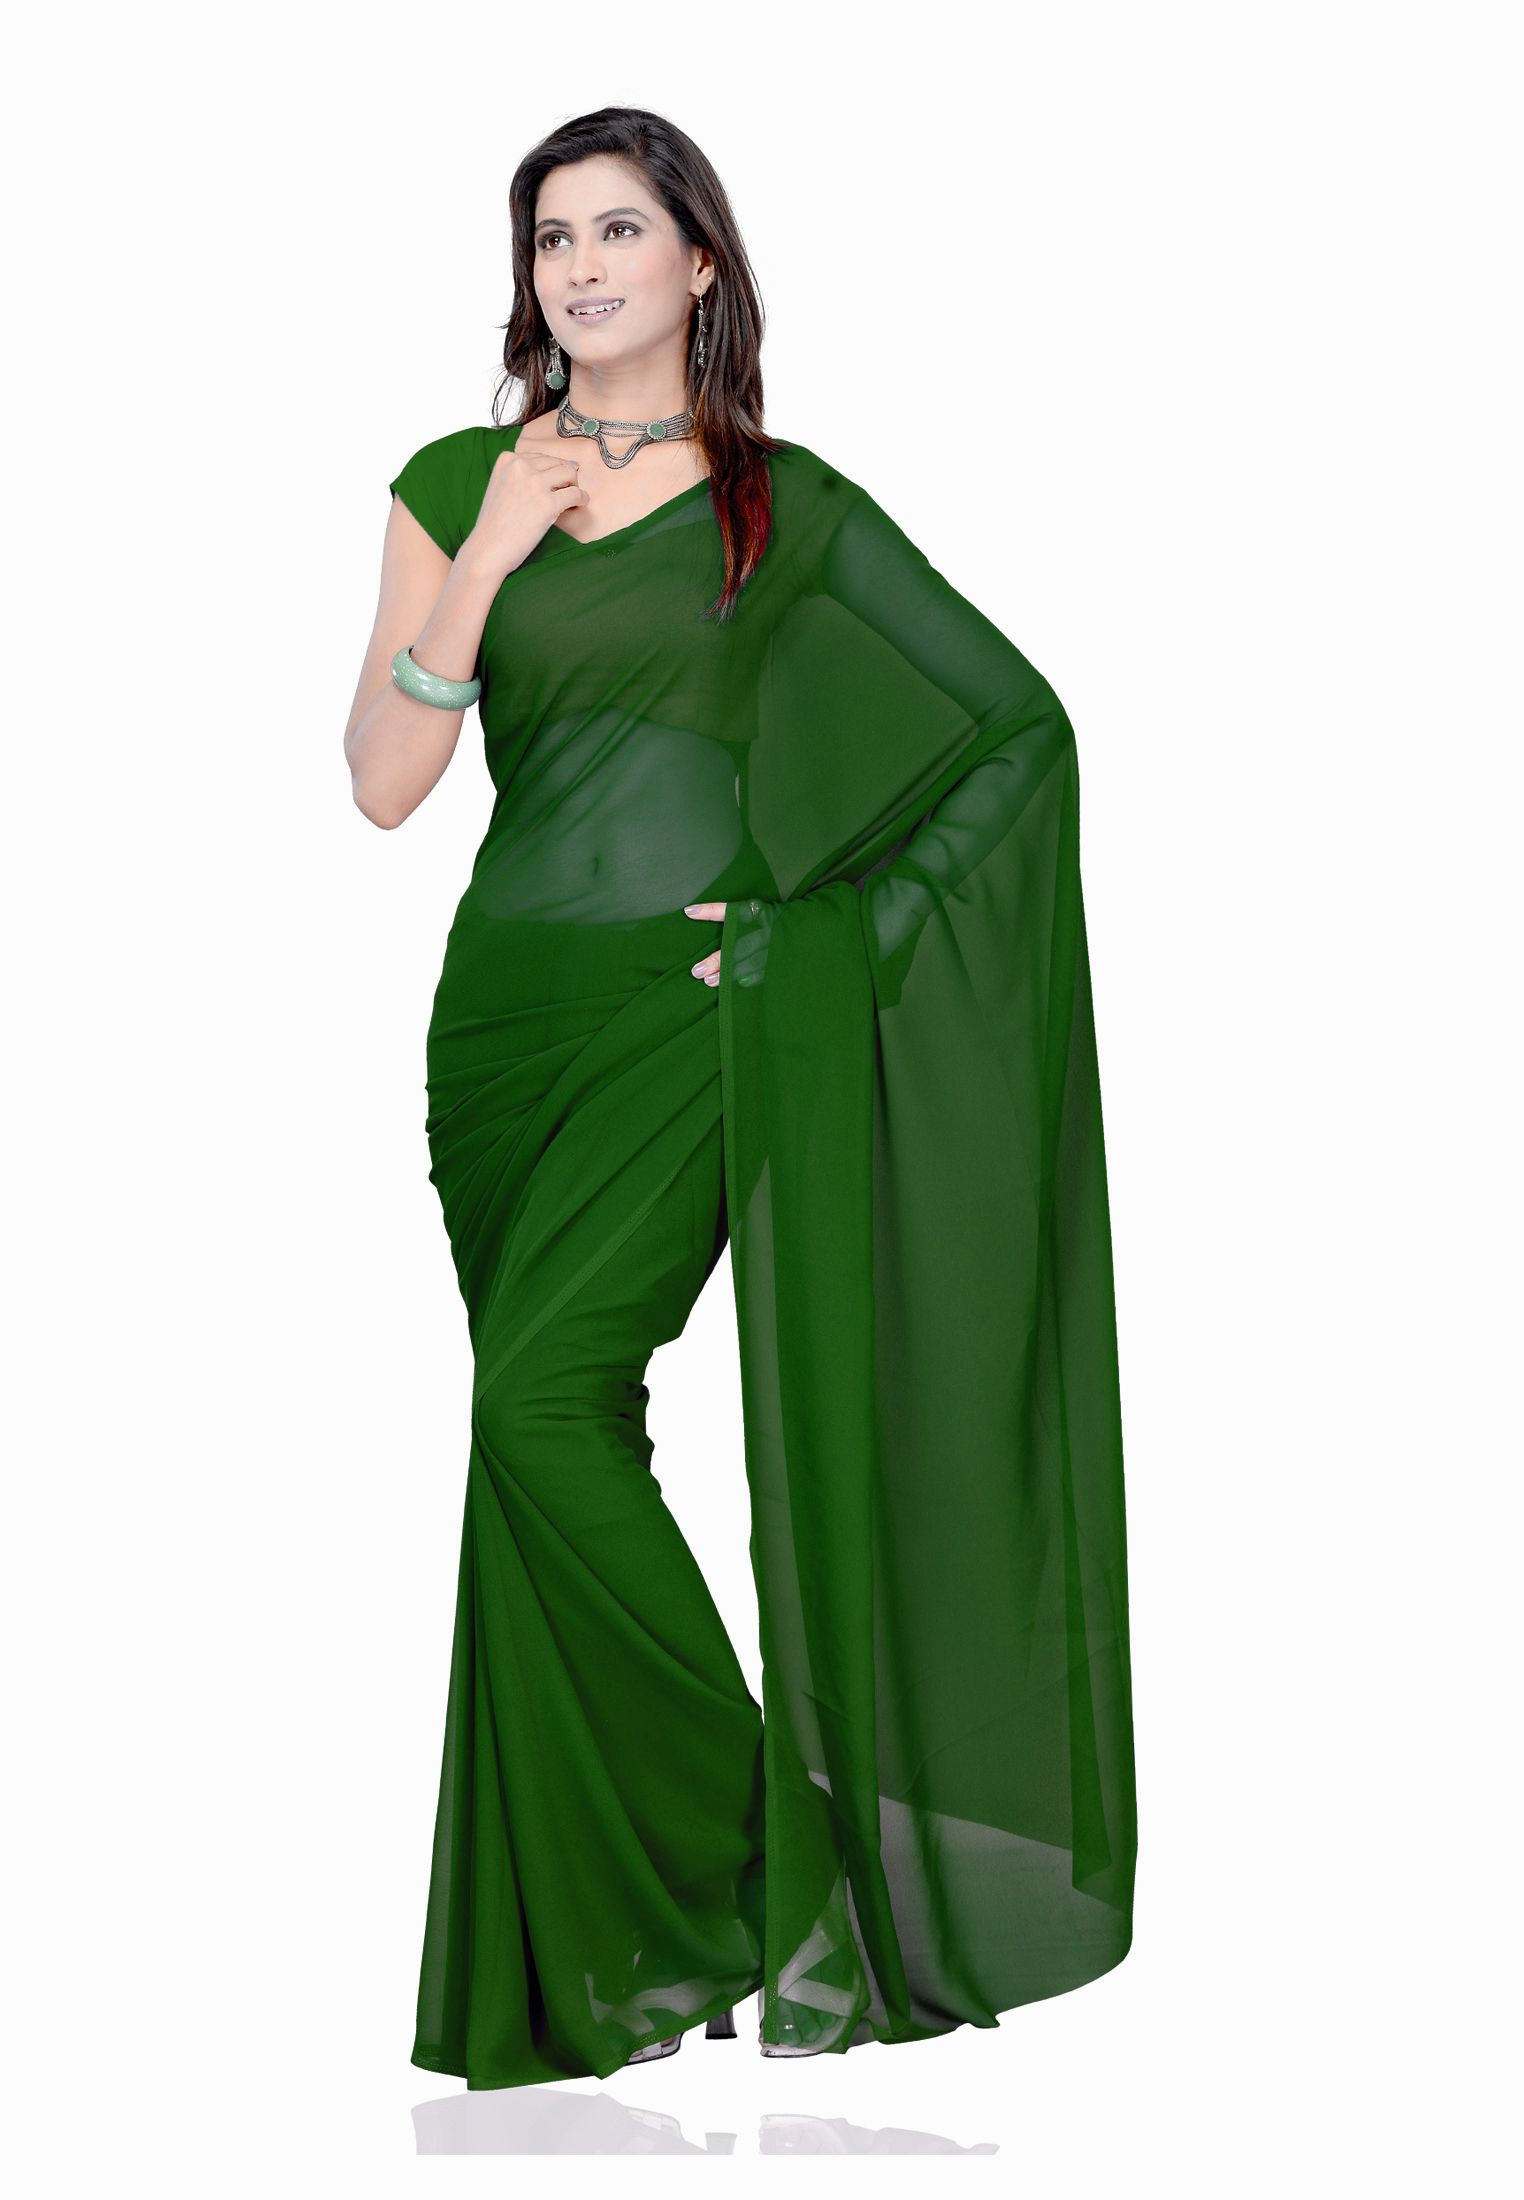 Plain Dark Green Colour Chiffon Fabric Saree With Blouse Plain Saree Blouse Piece Georgette Sarees